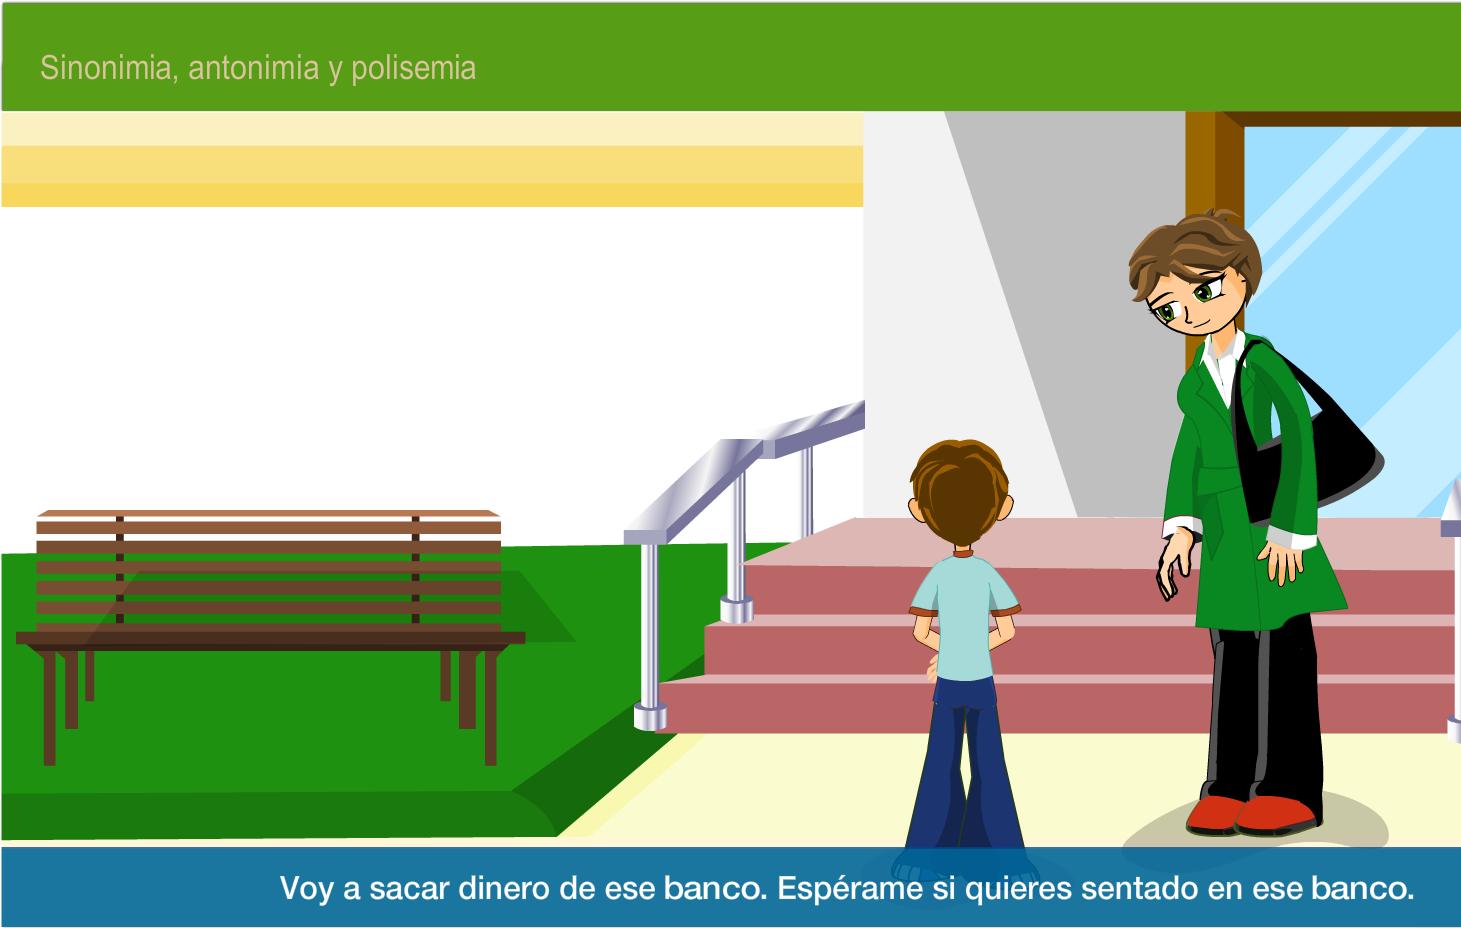 http://www.edu.xunta.es/espazoAbalar/sites/espazoAbalar/files/datos/1285224639/contido/lc16_oa05_es/index.html